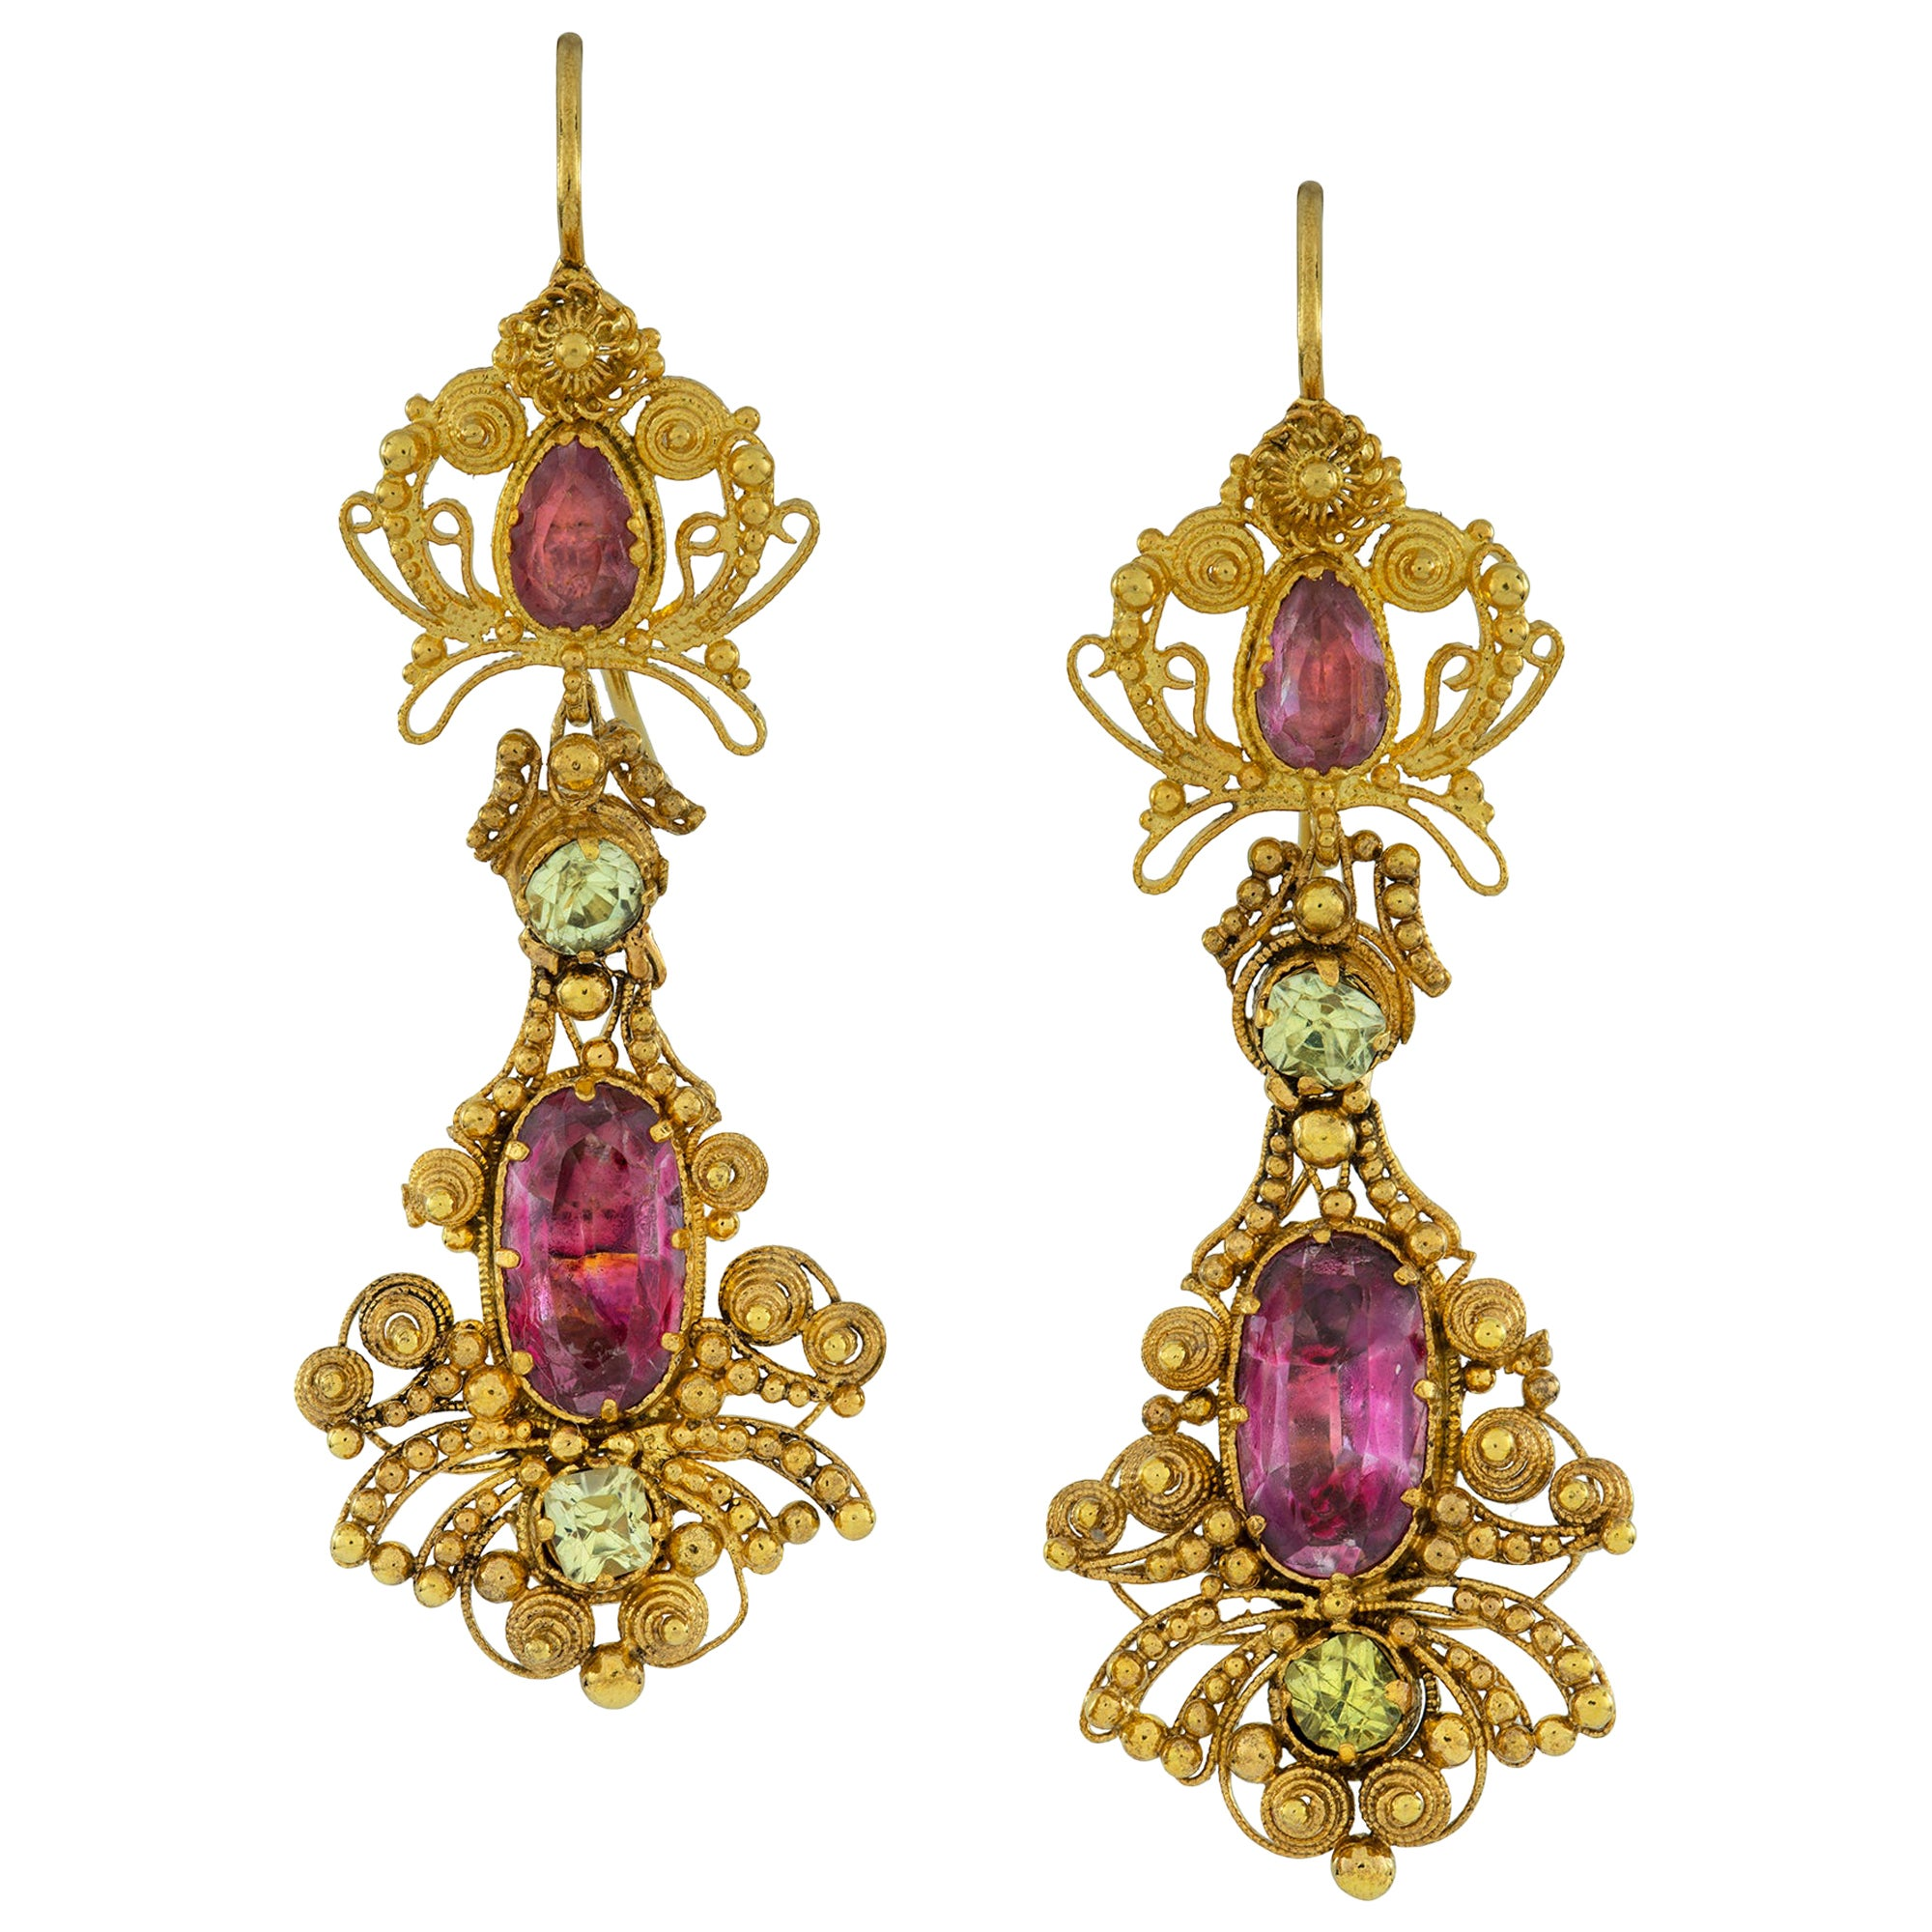 Pair of Georgian Topaz Drop Earrings